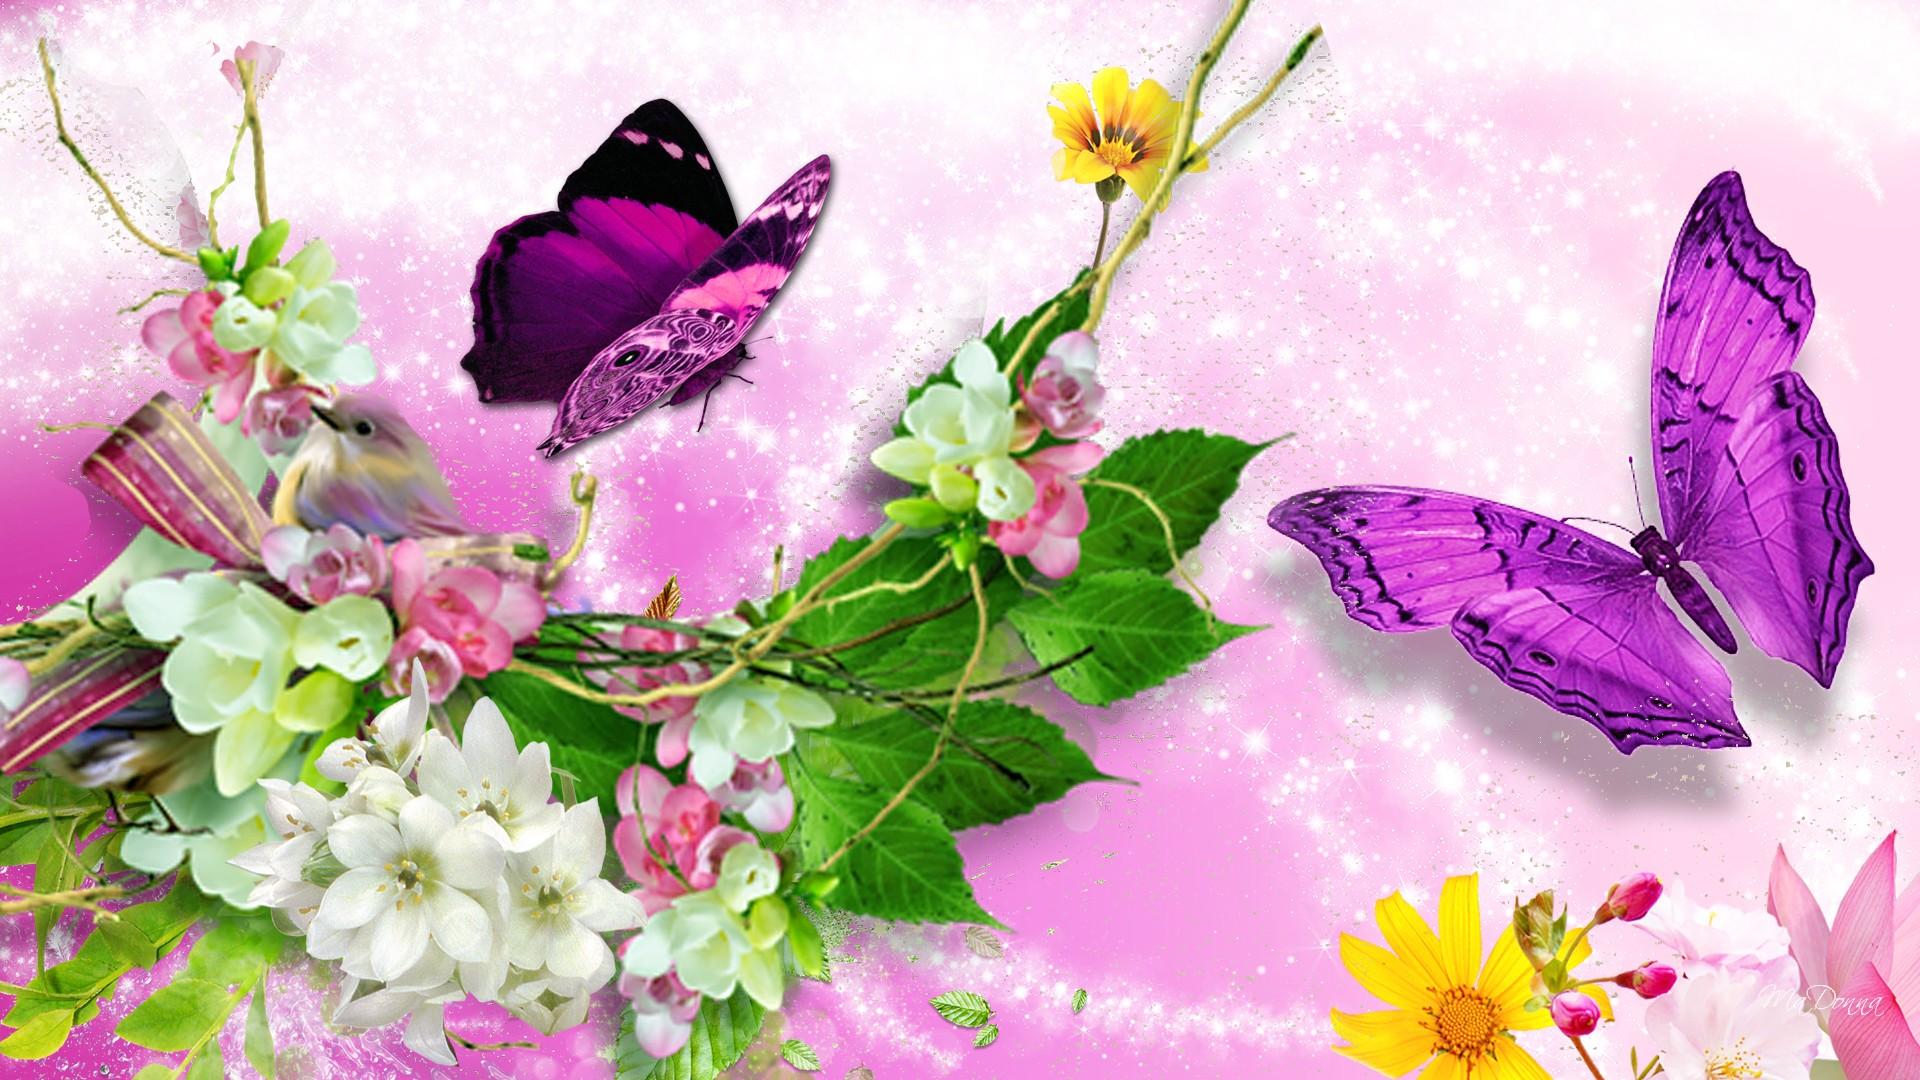 brillante mariposas brillantes BL wallpaper   ForWallpapercom 1920x1080